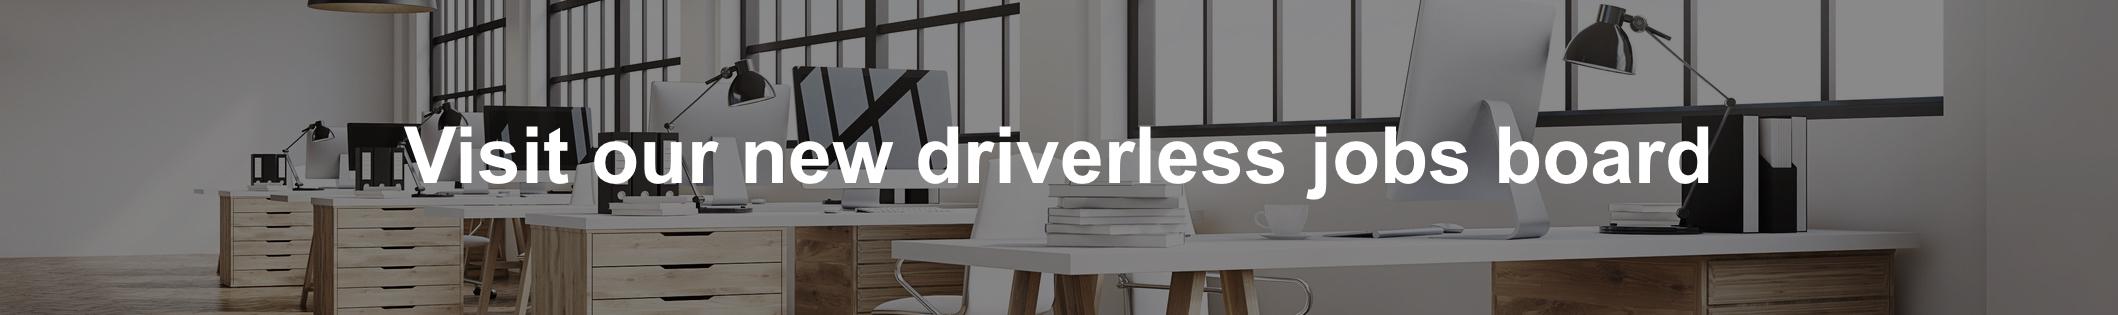 Driverless jobs board advert.jpg